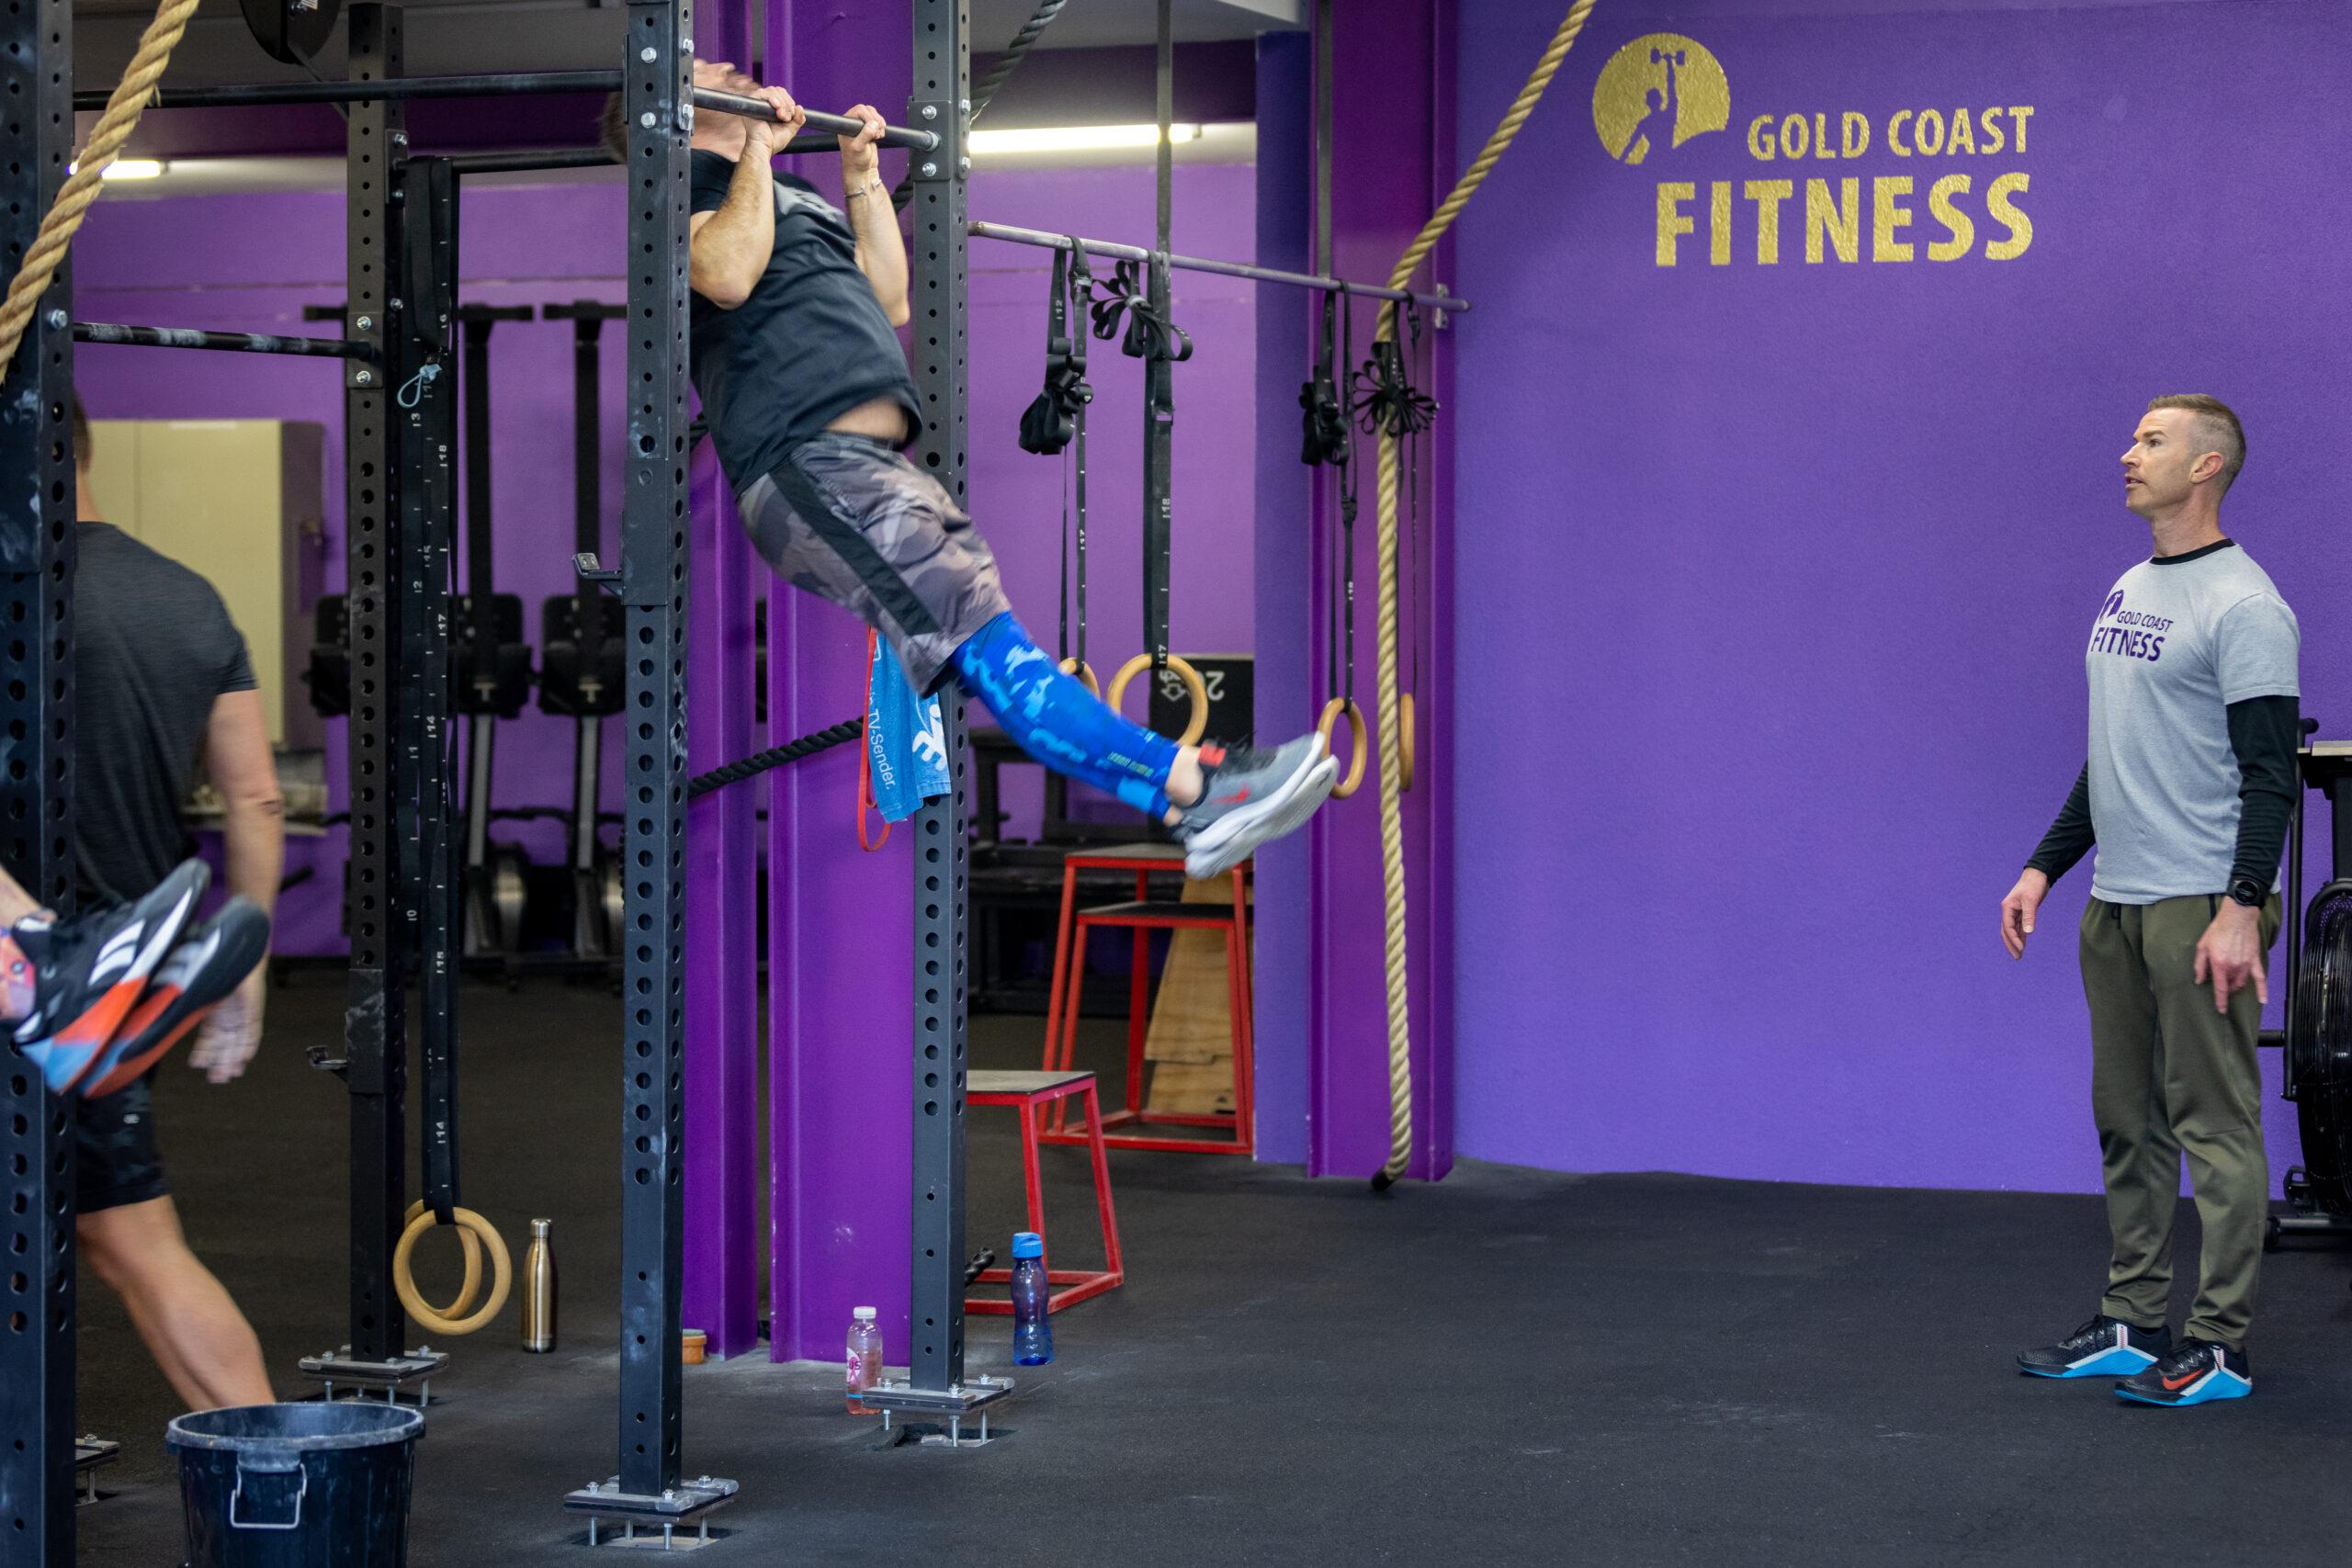 Gold Coast Fitness - Individualisiertes Training Gym Uetikon am See